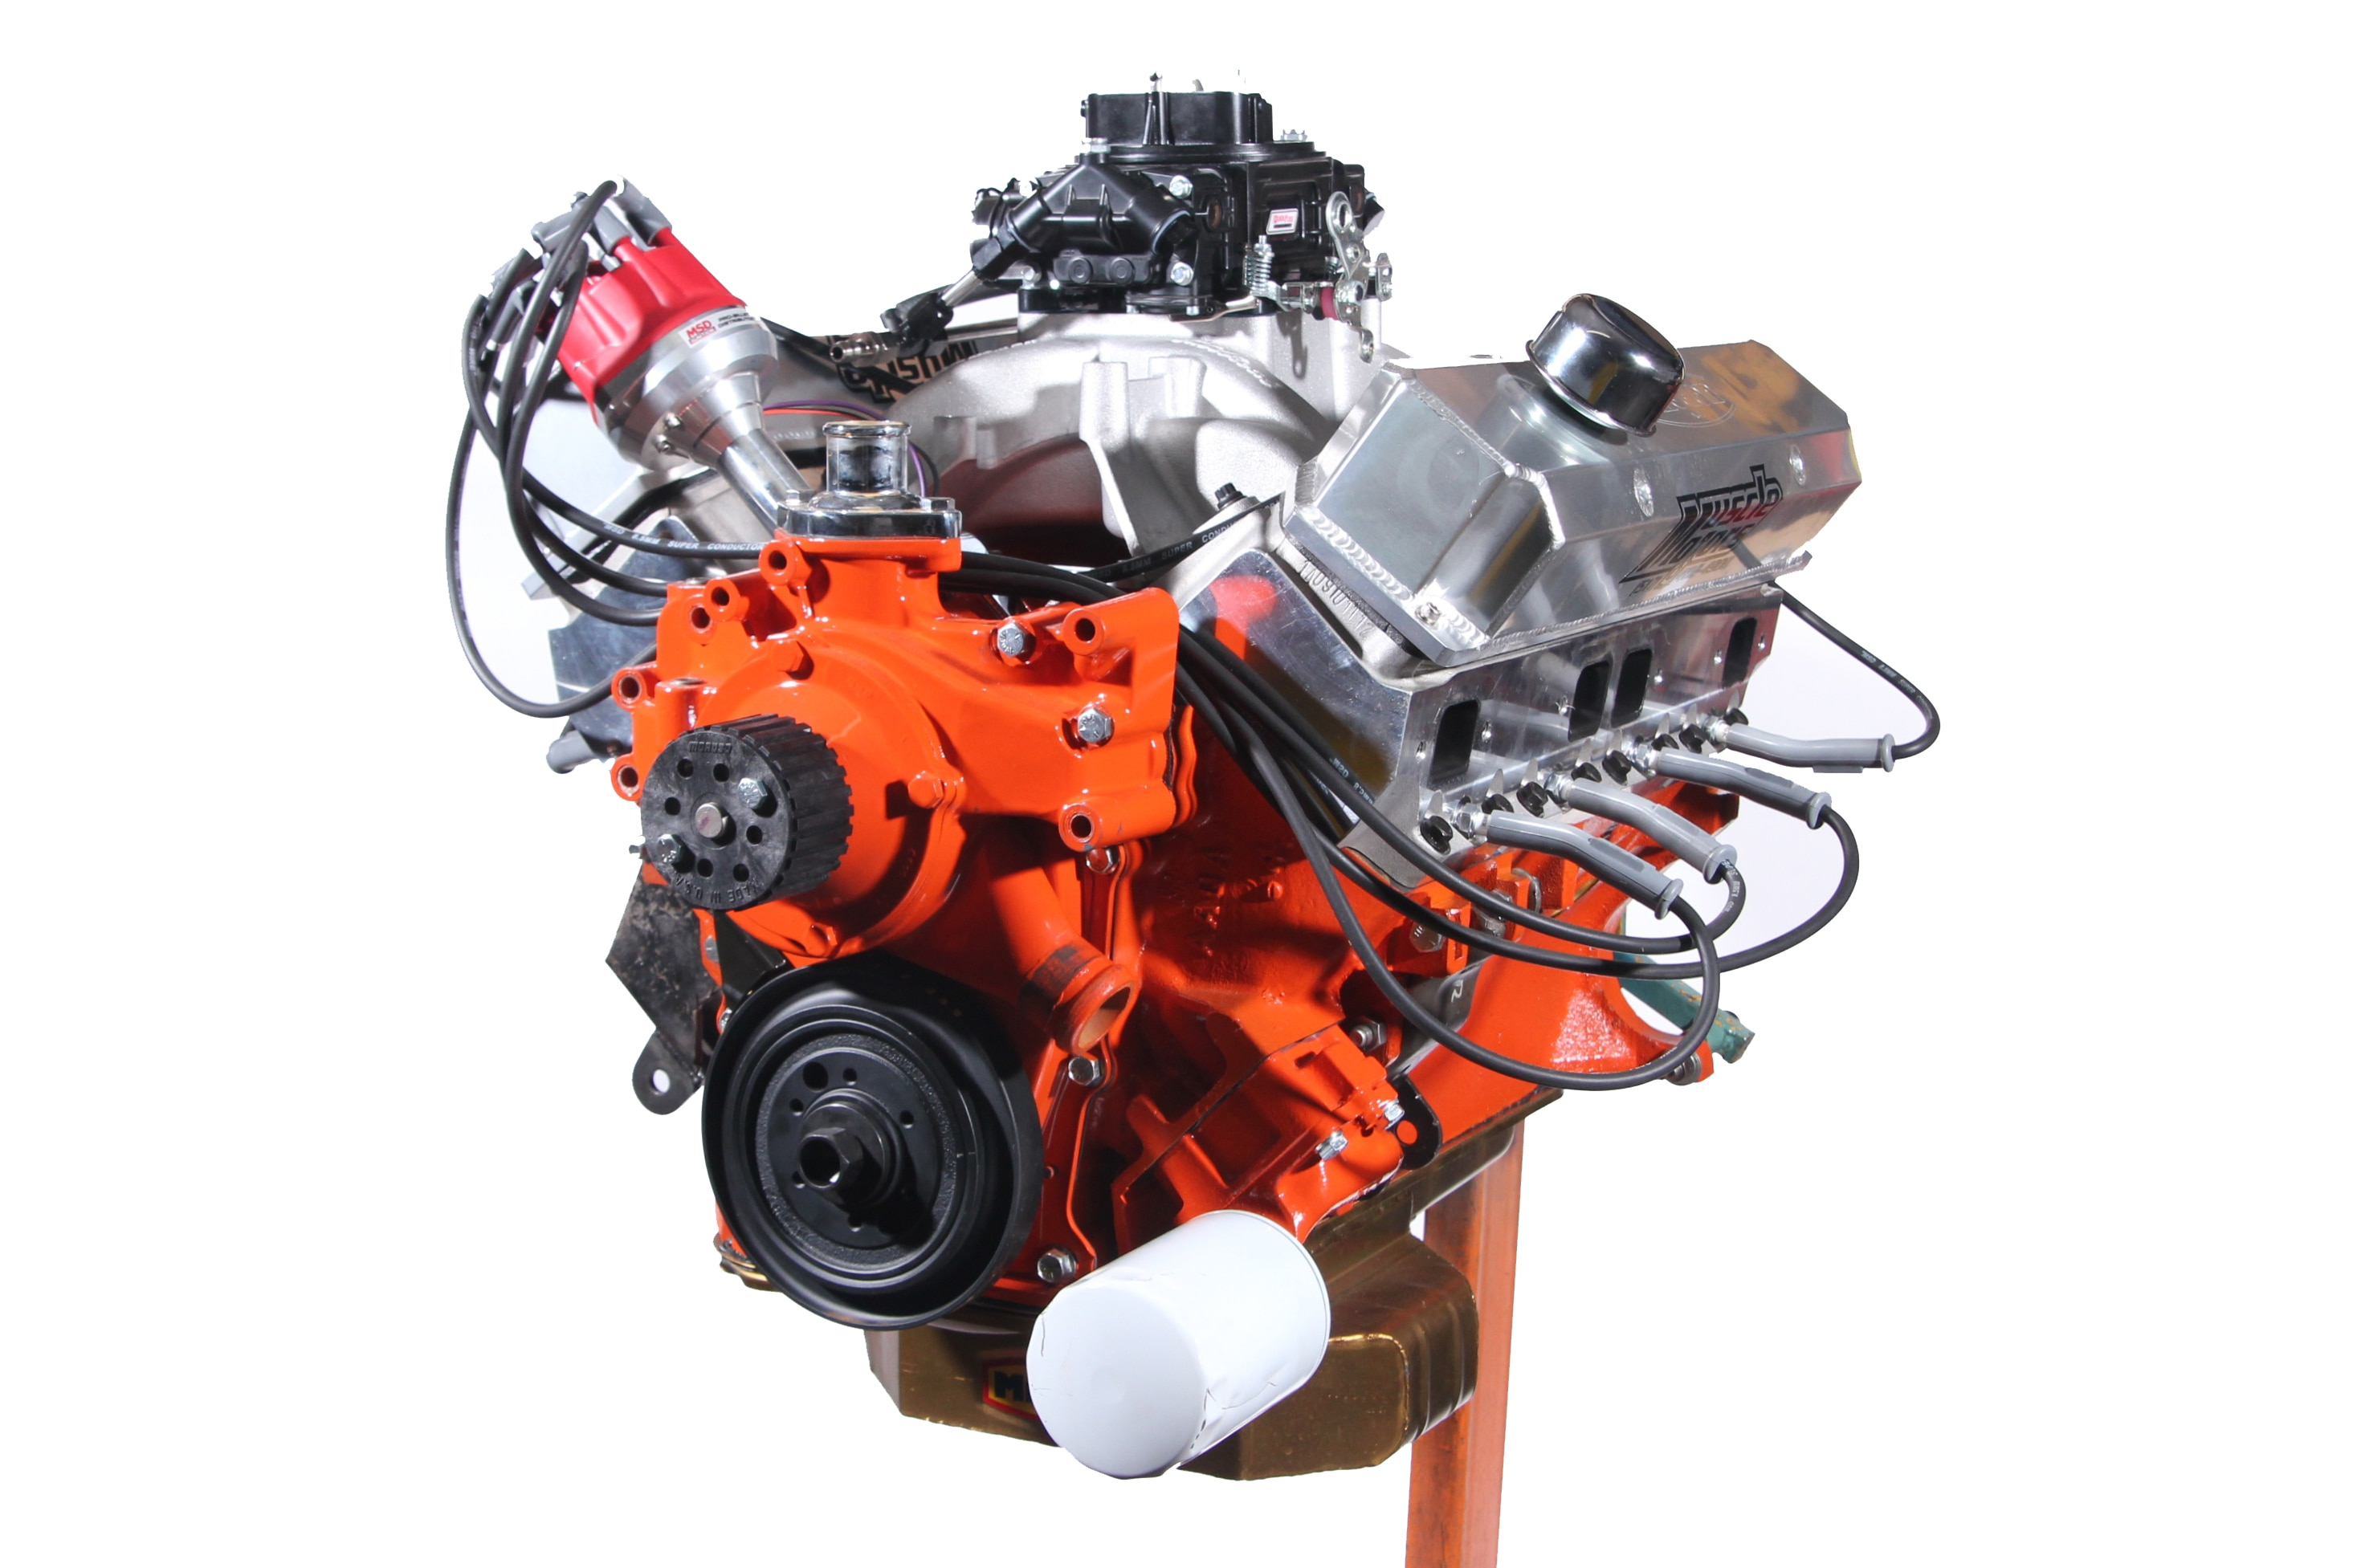 hight resolution of chrysler 383 big block mopar for the masses hot rod network chrysler 383 engine diagrams